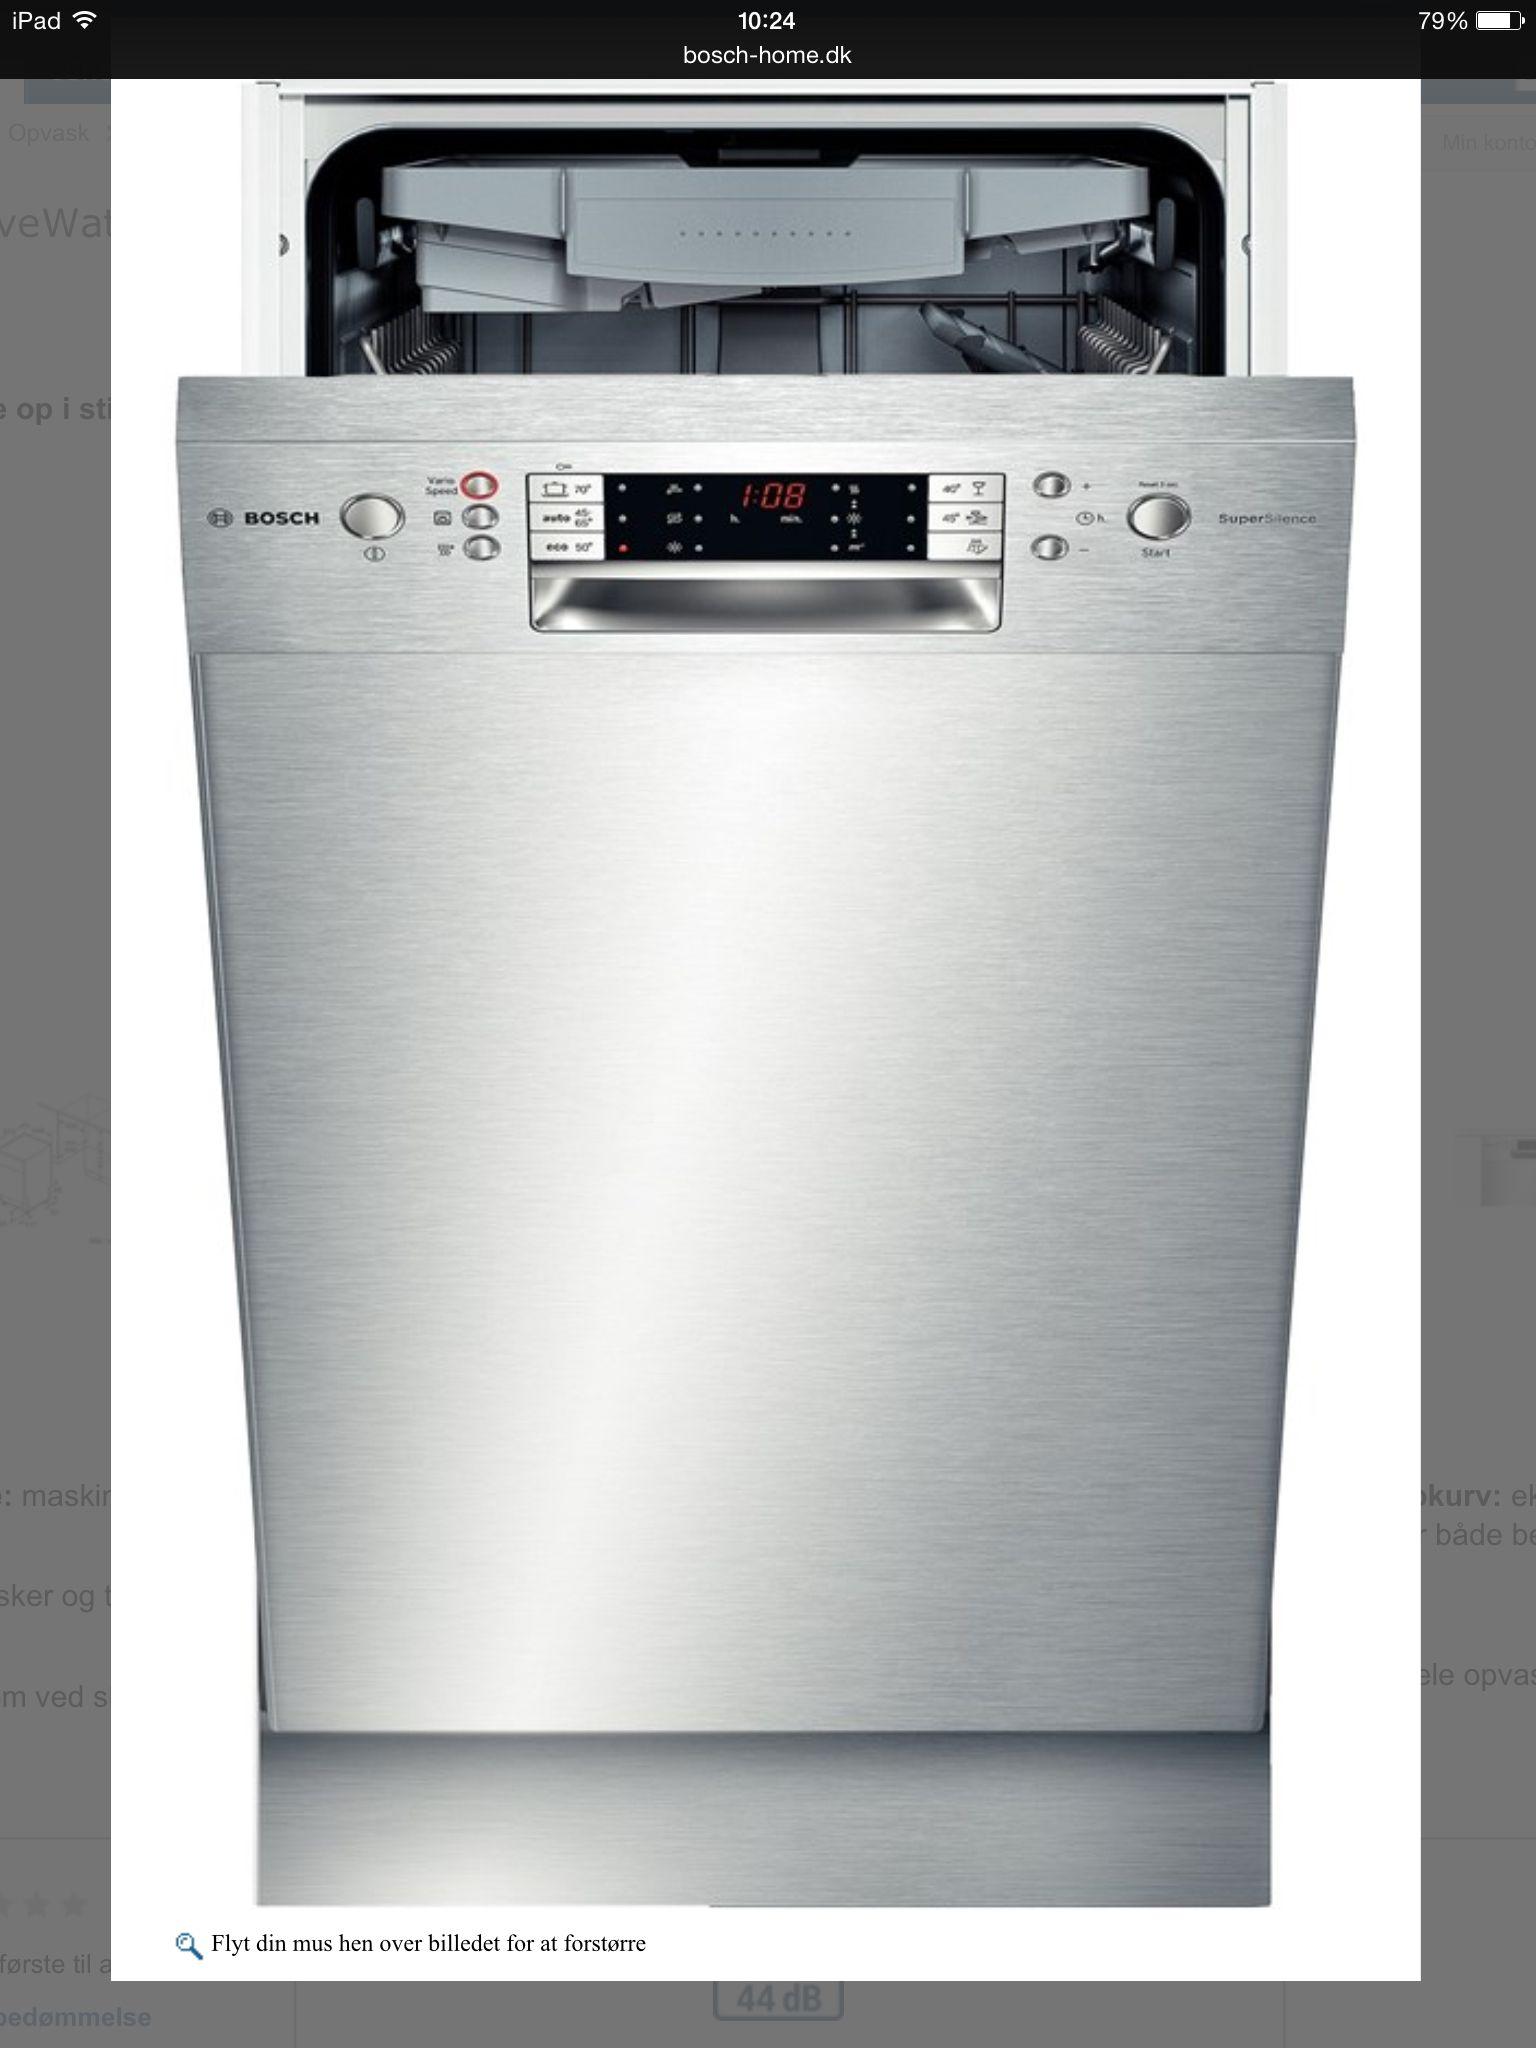 Bosch Dishwasher Error Codes How To Clear What To Check Bosch Dishwashers Bosch Dishwasher Repair Dishwasher